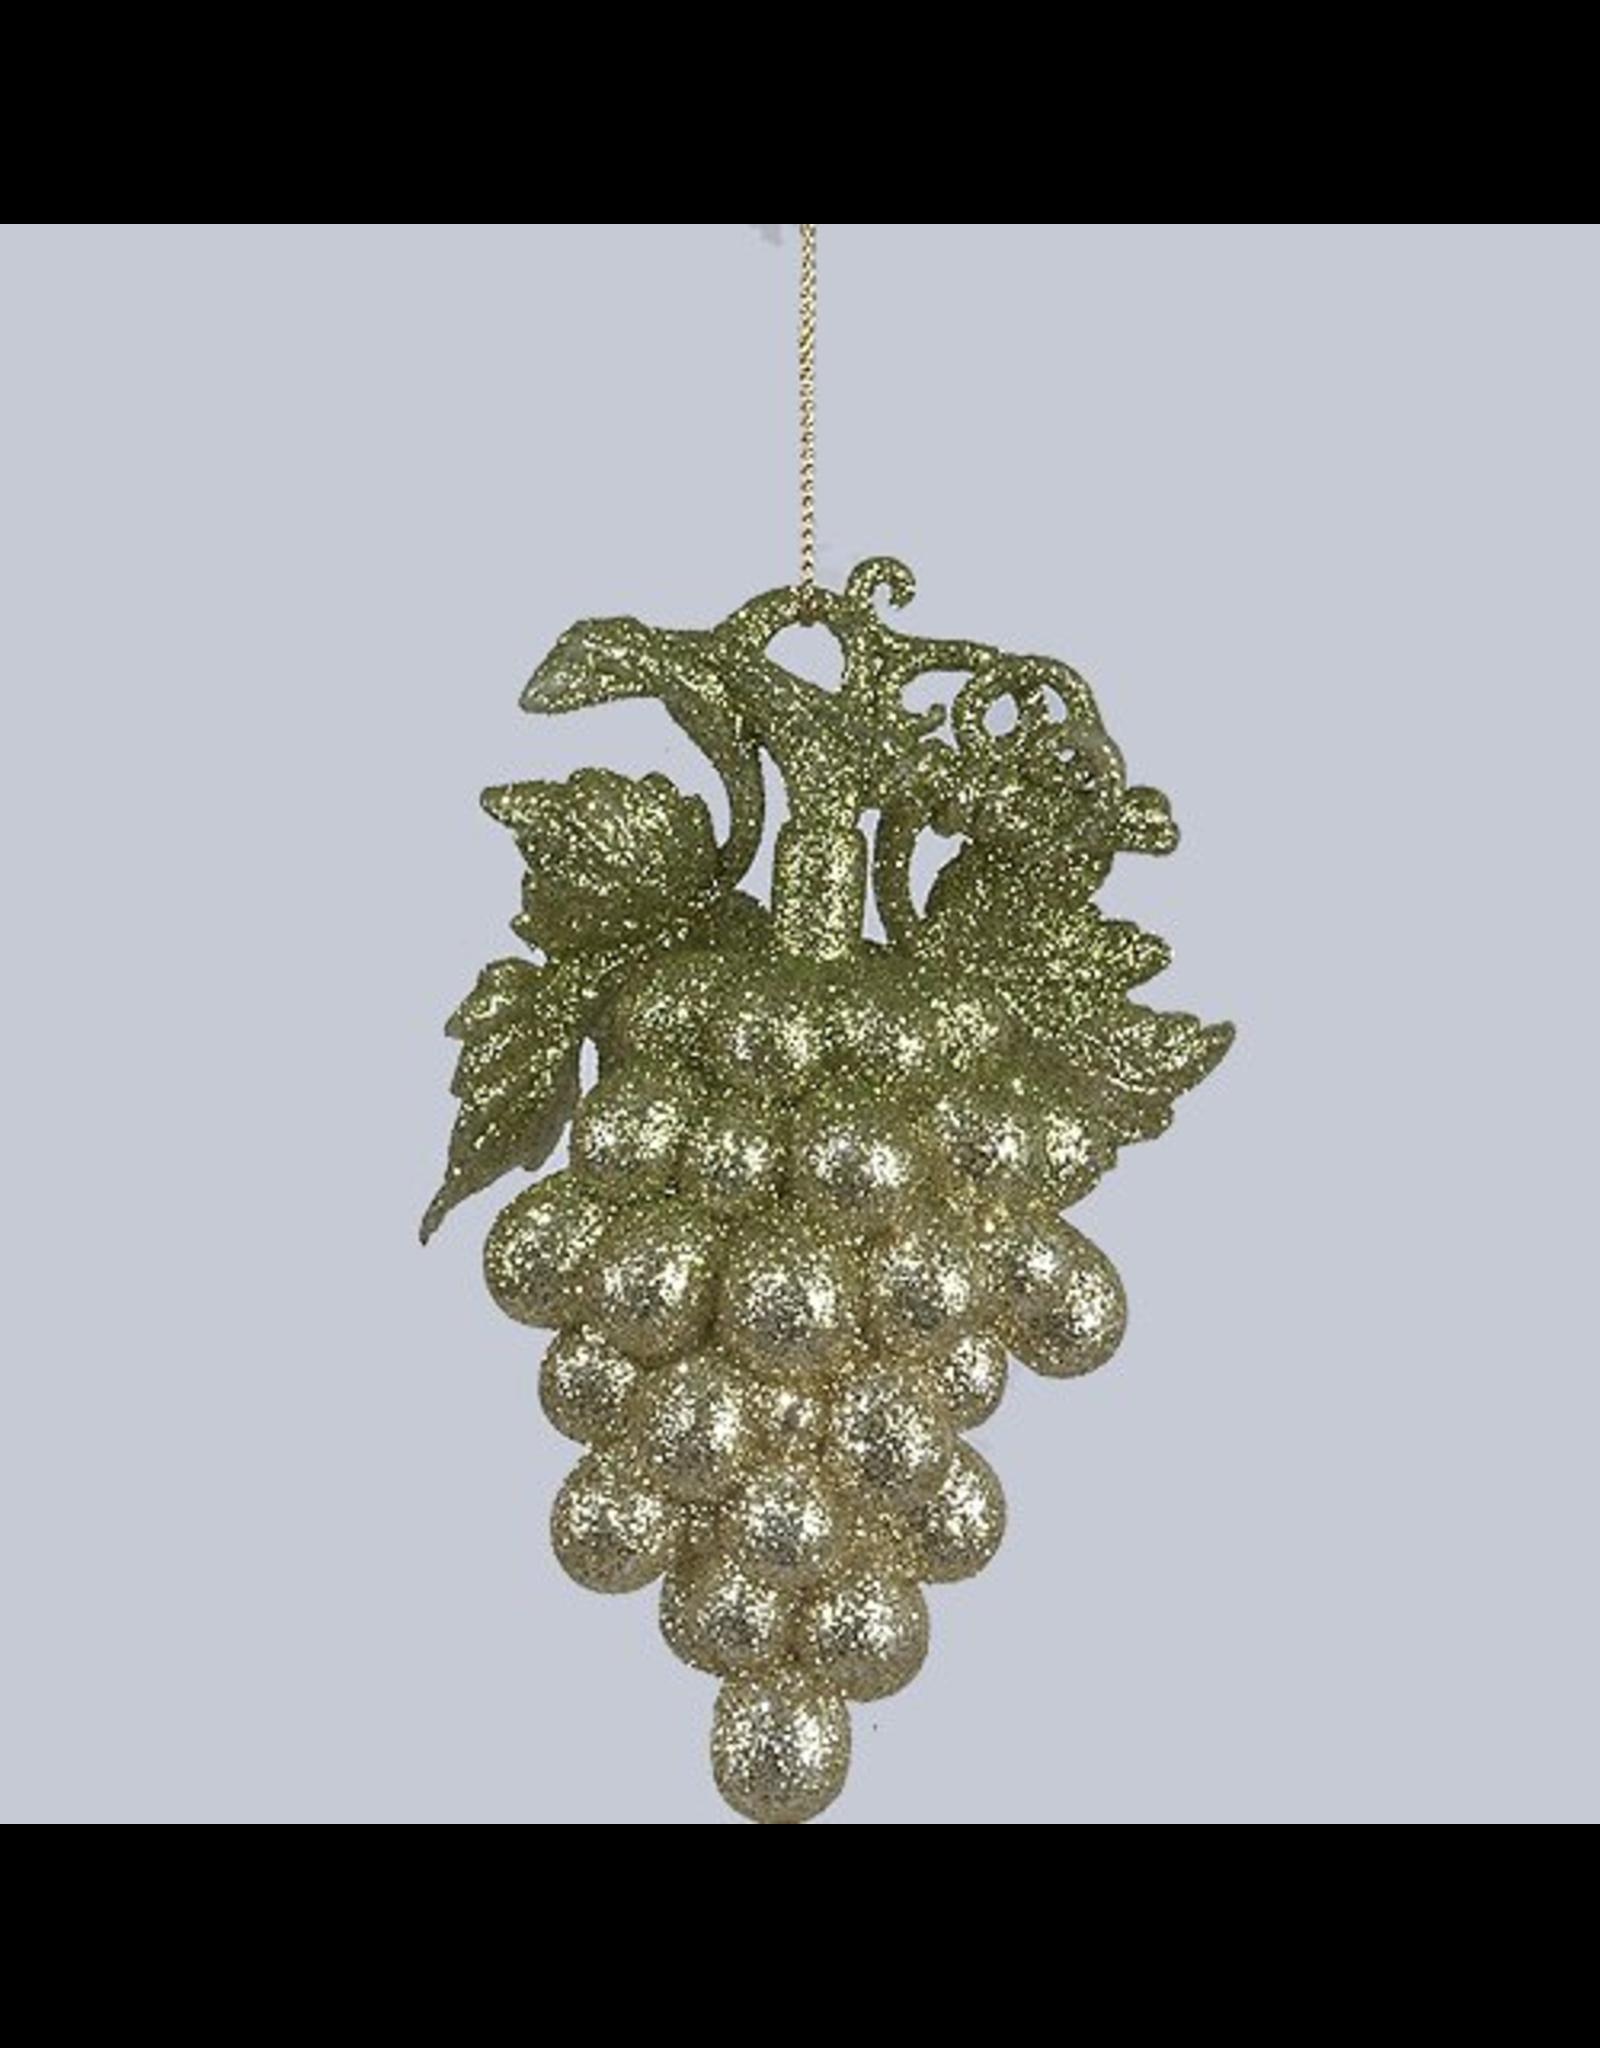 Kurt Adler Acrylic Green Clittered Grapes Ornament 5 Inch